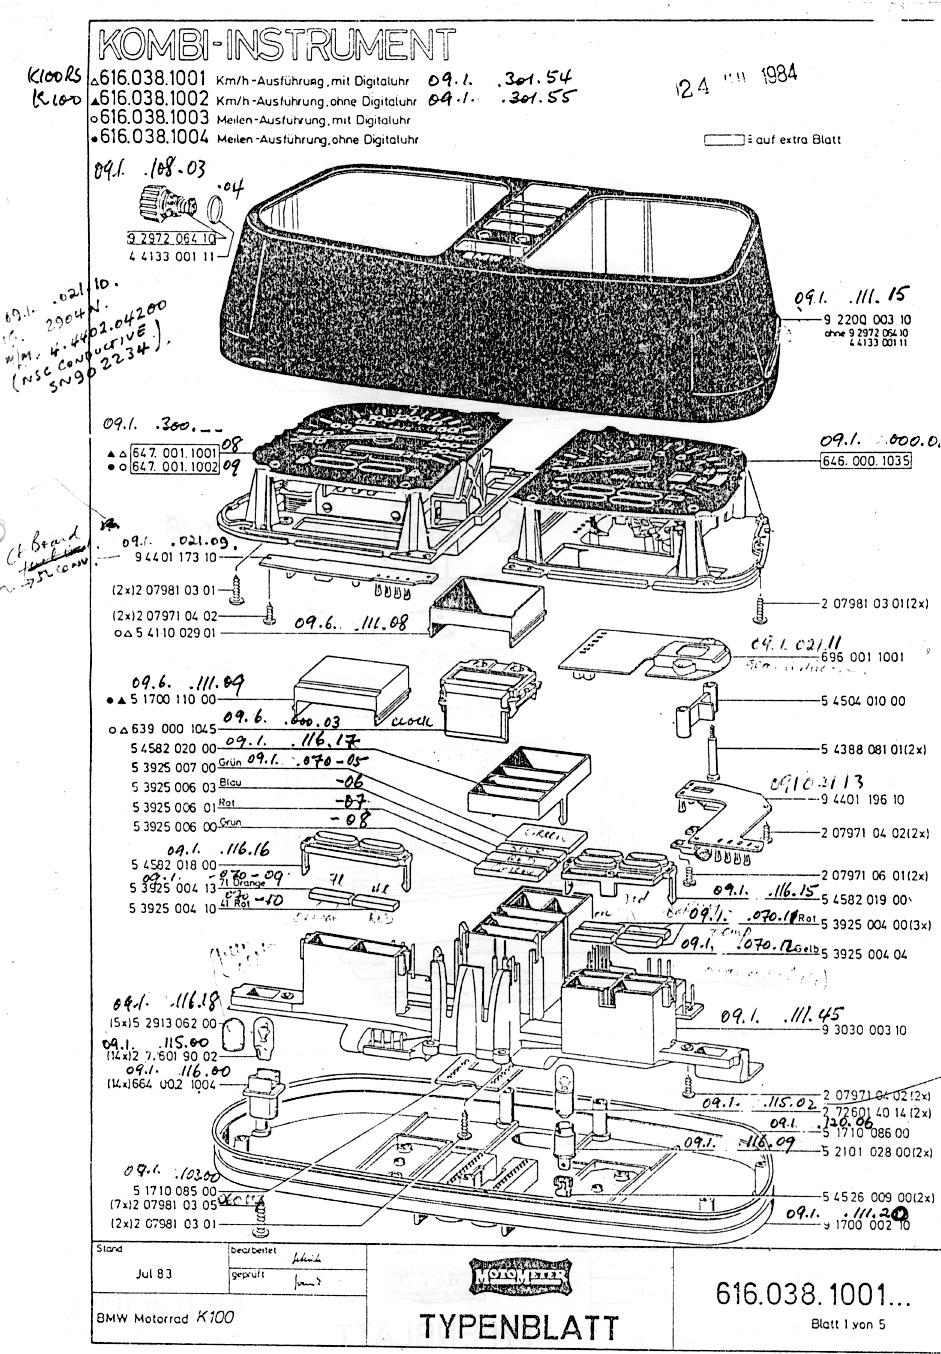 hight resolution of wrg 0912 wiring diagram bmw k1200 bmw k 1200 wiring diagram